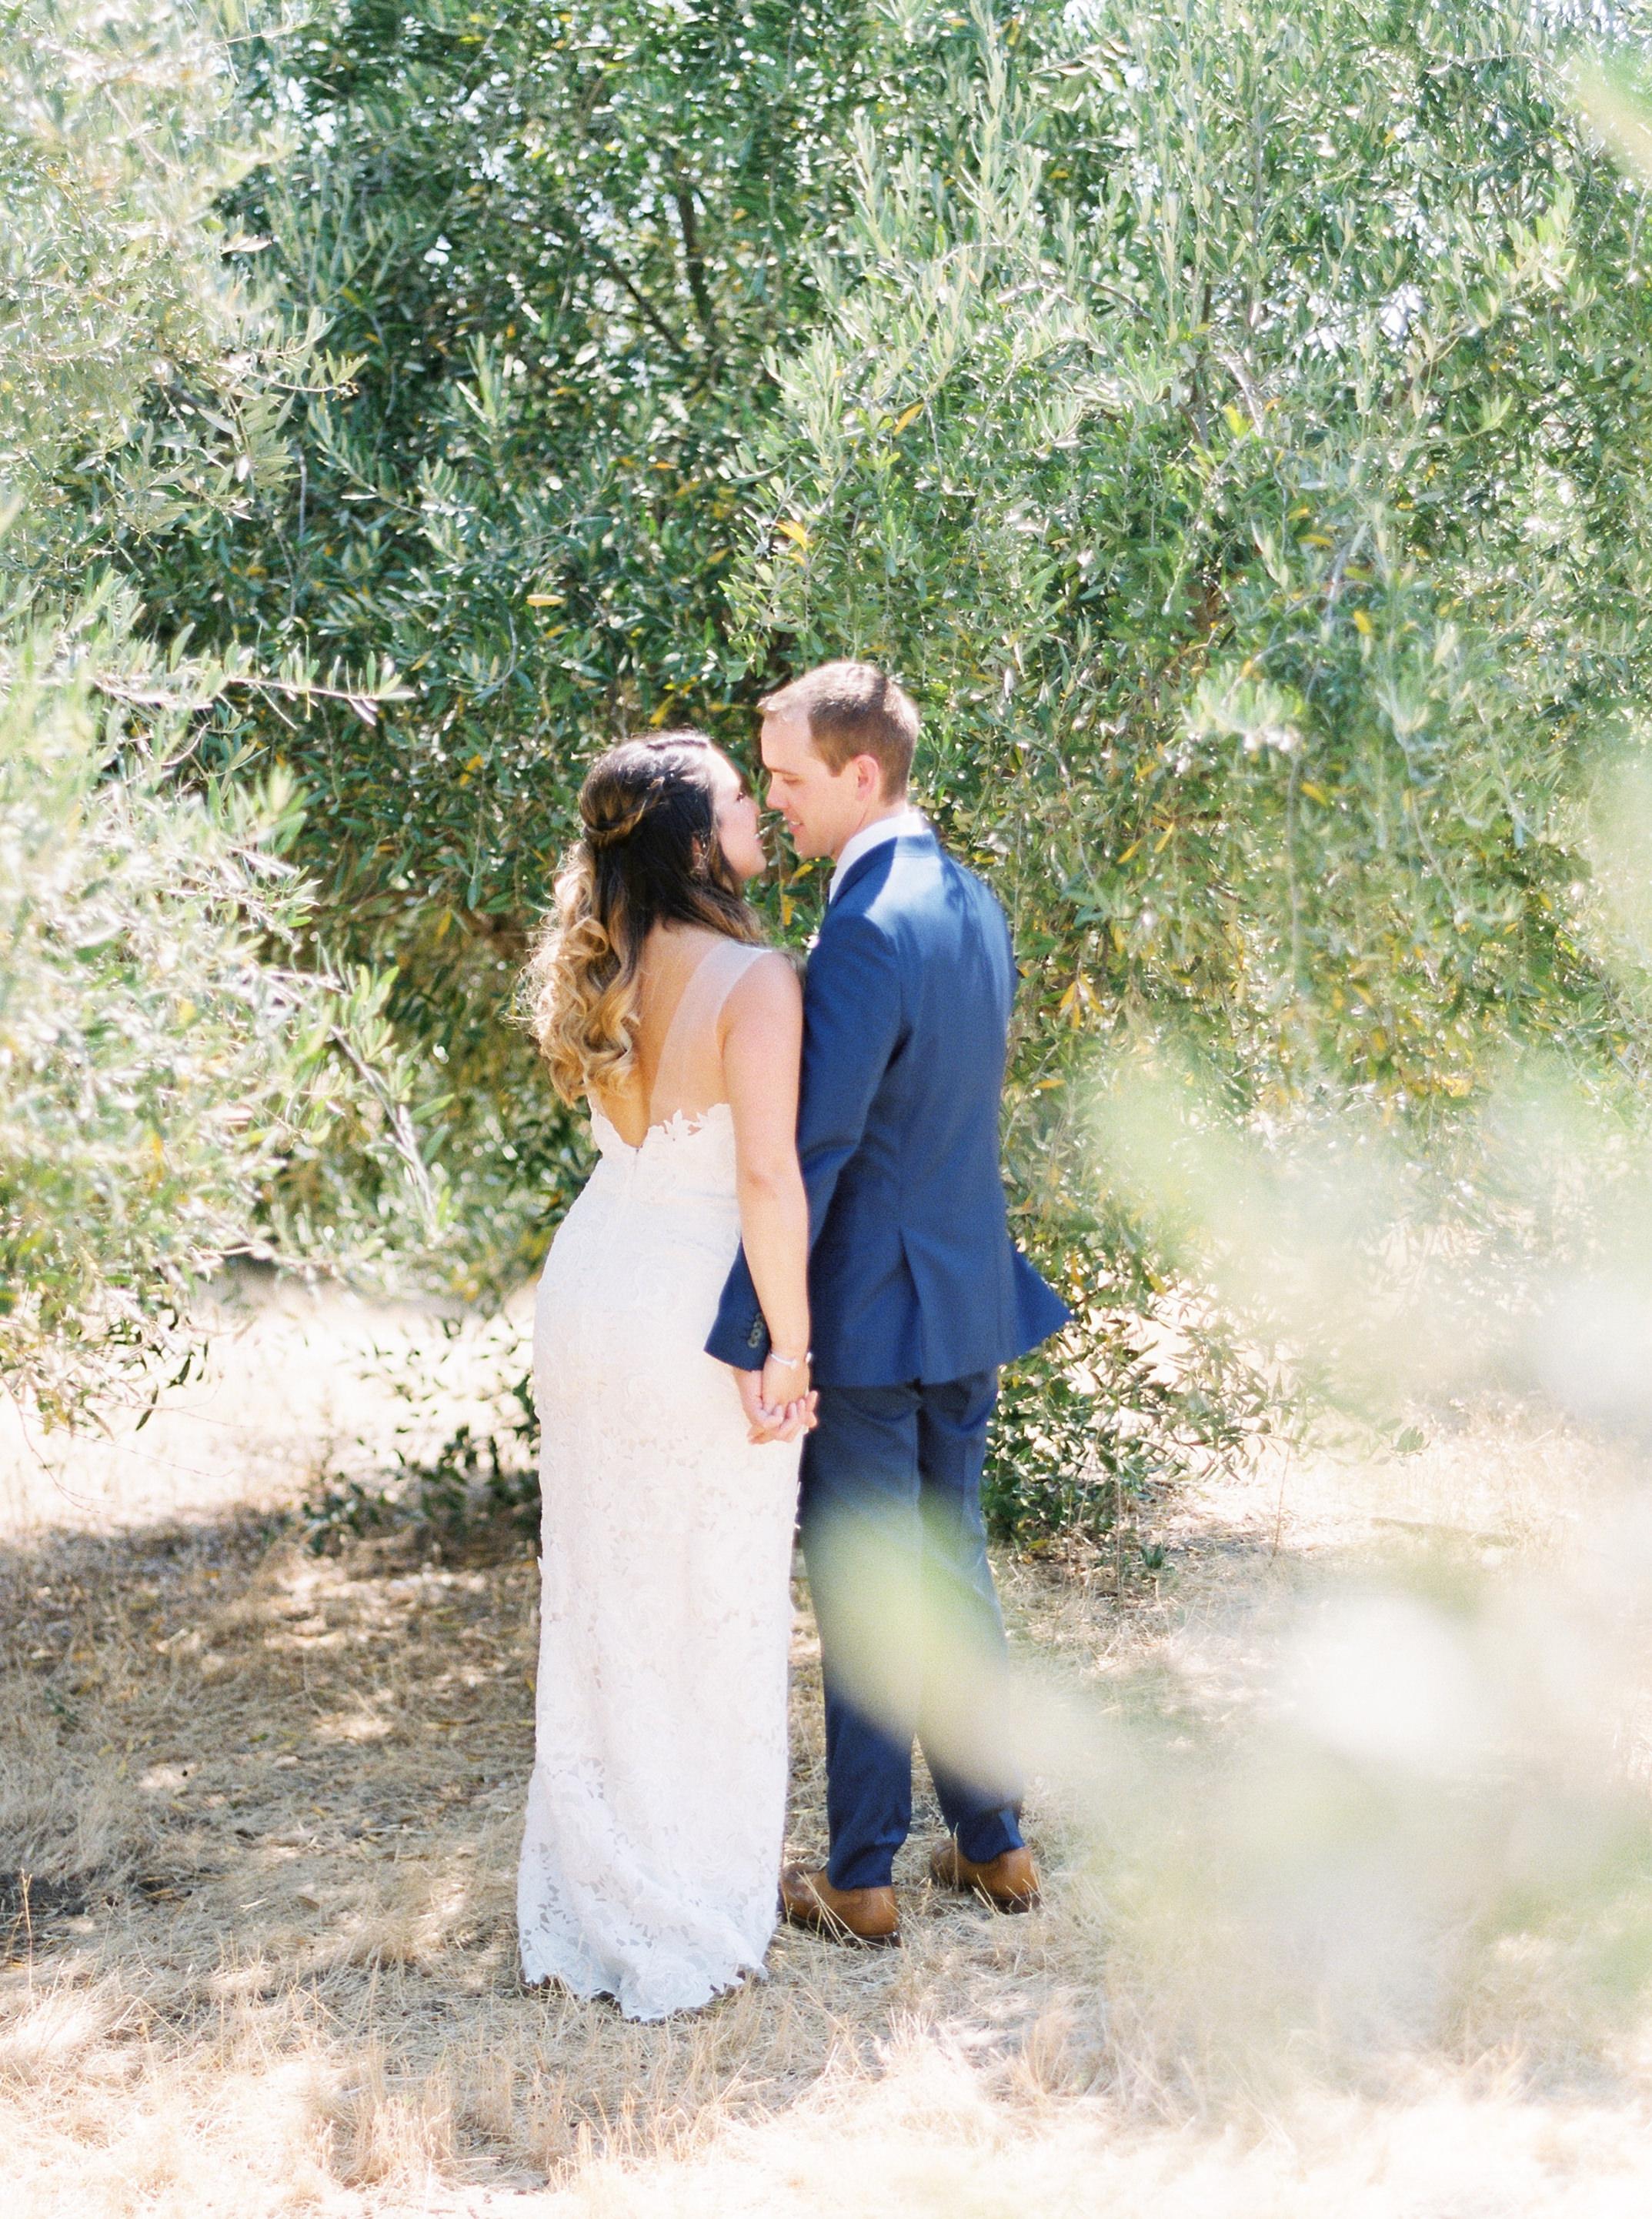 the-purple-orchid-resort-wedding-in-livermore-california-227.jpg